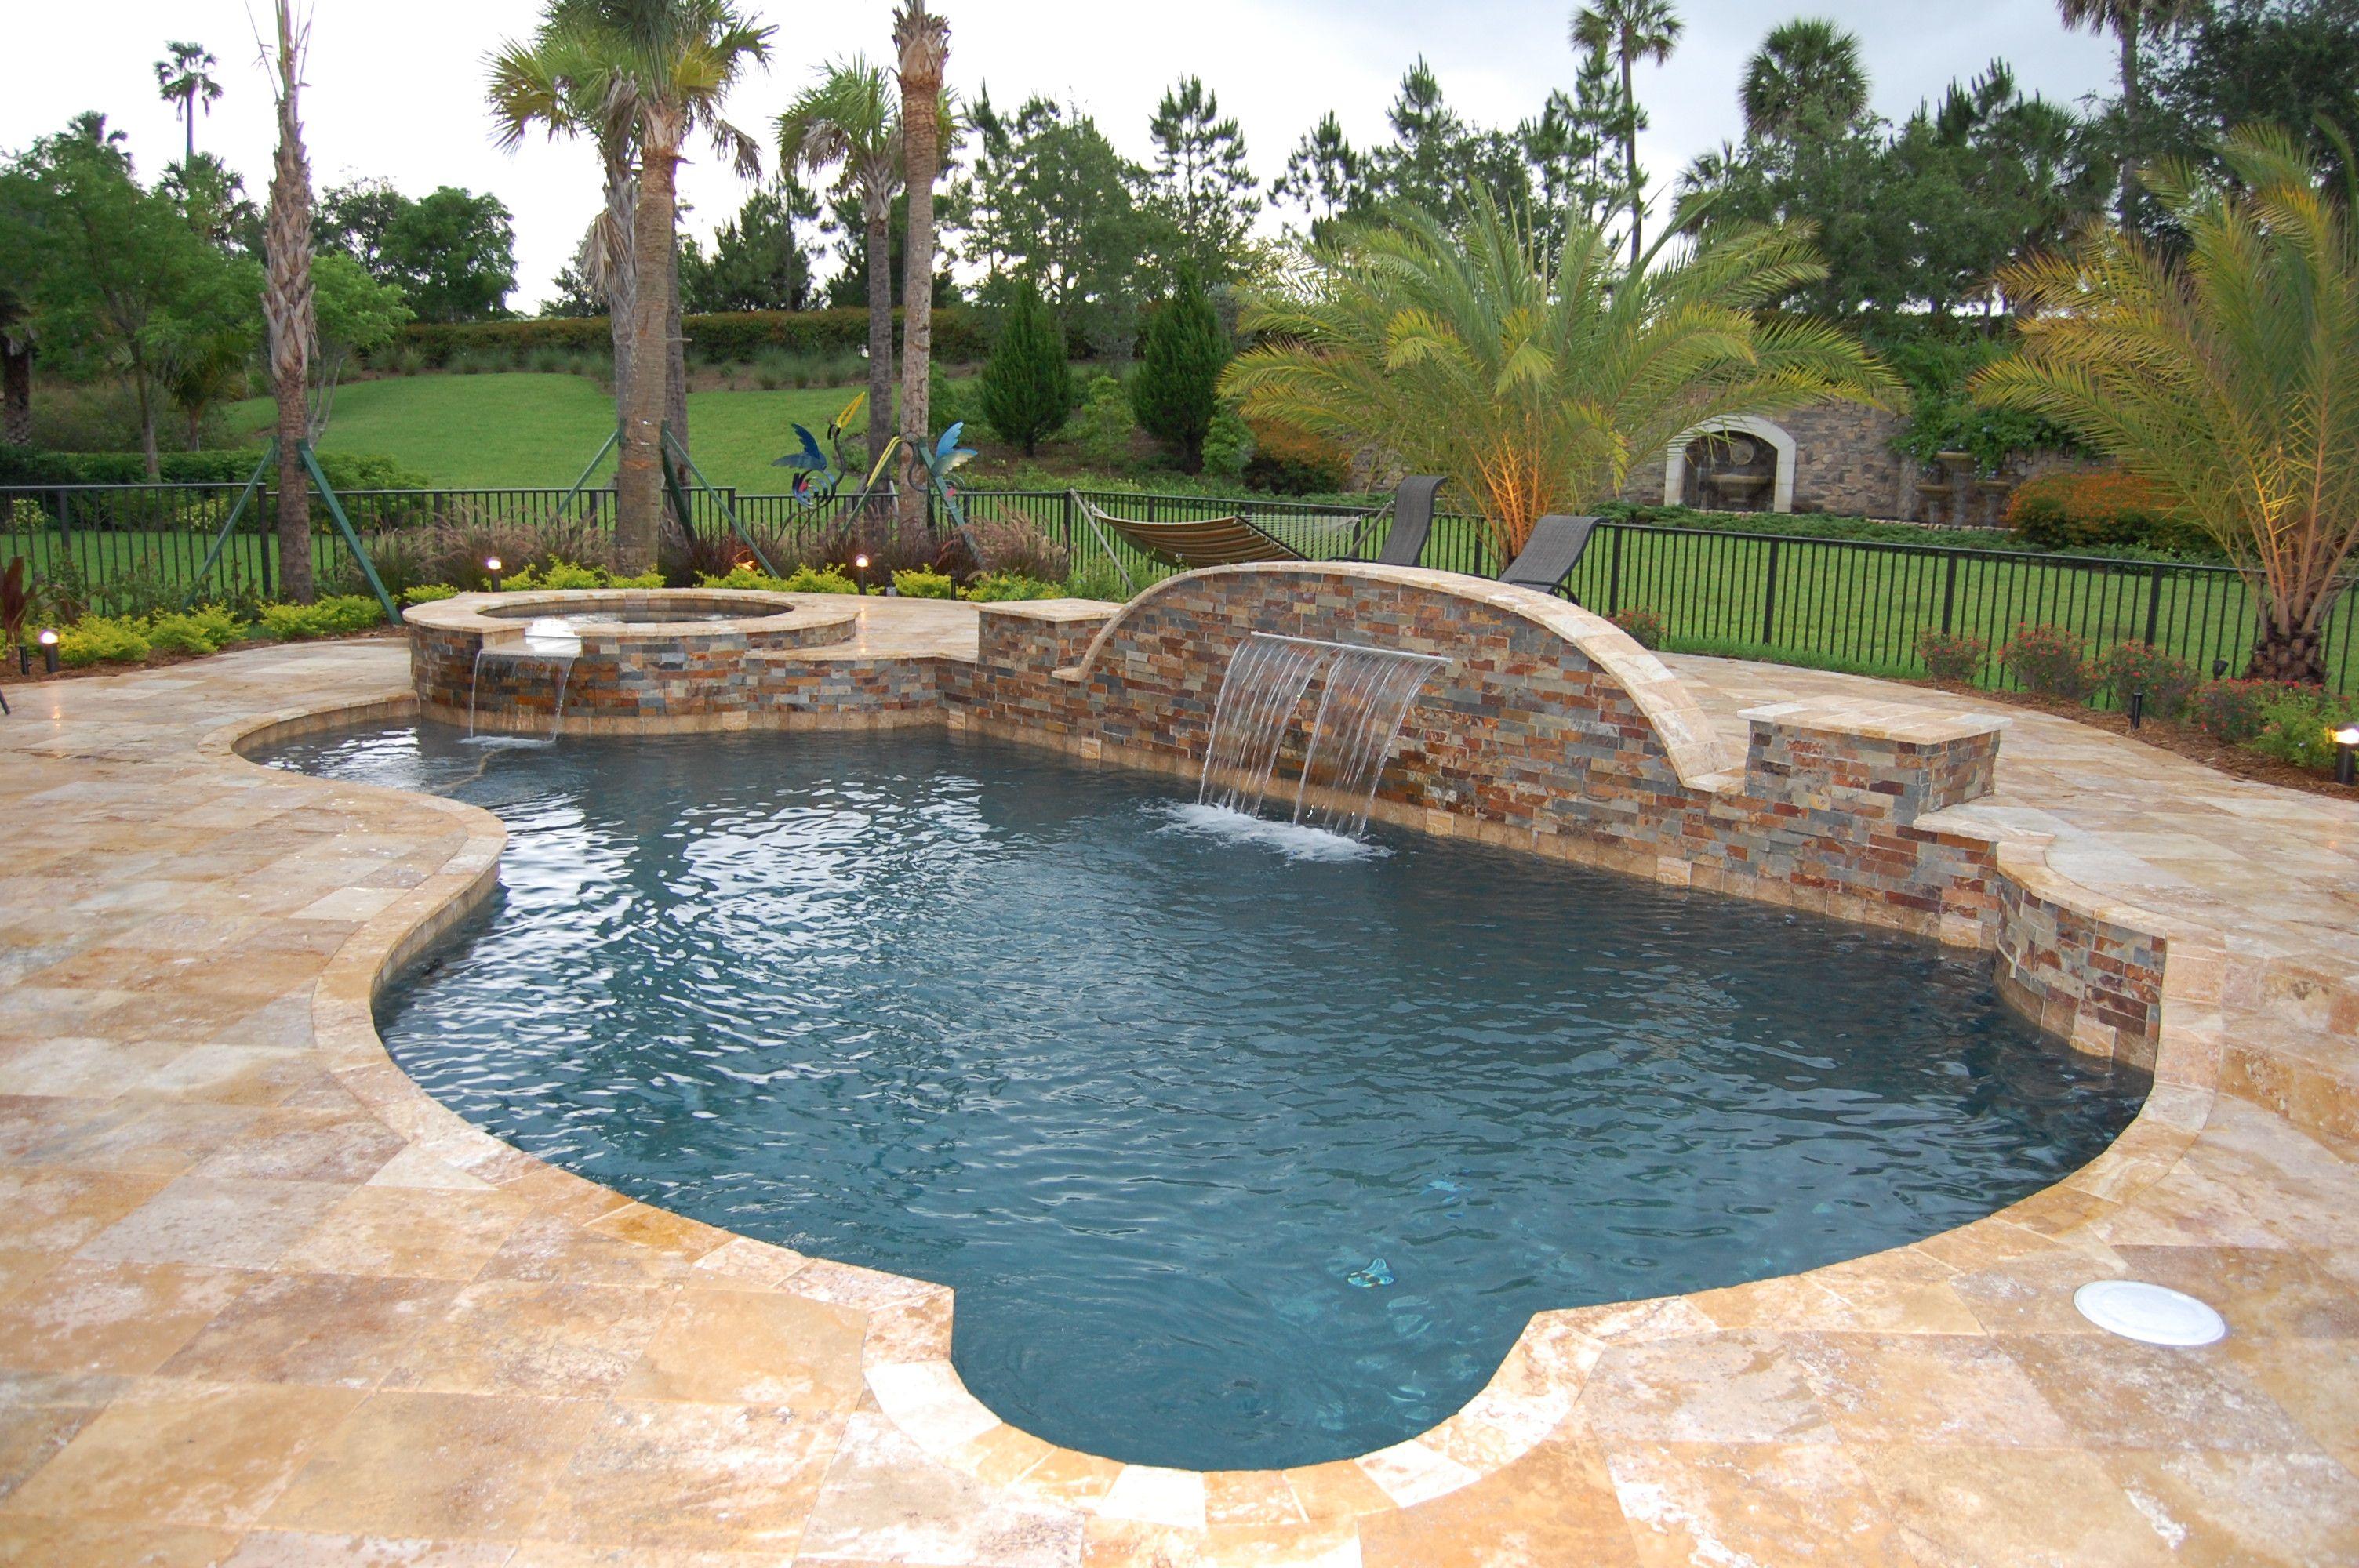 river rok baha sand backyard dreaming pinterest pool remodel